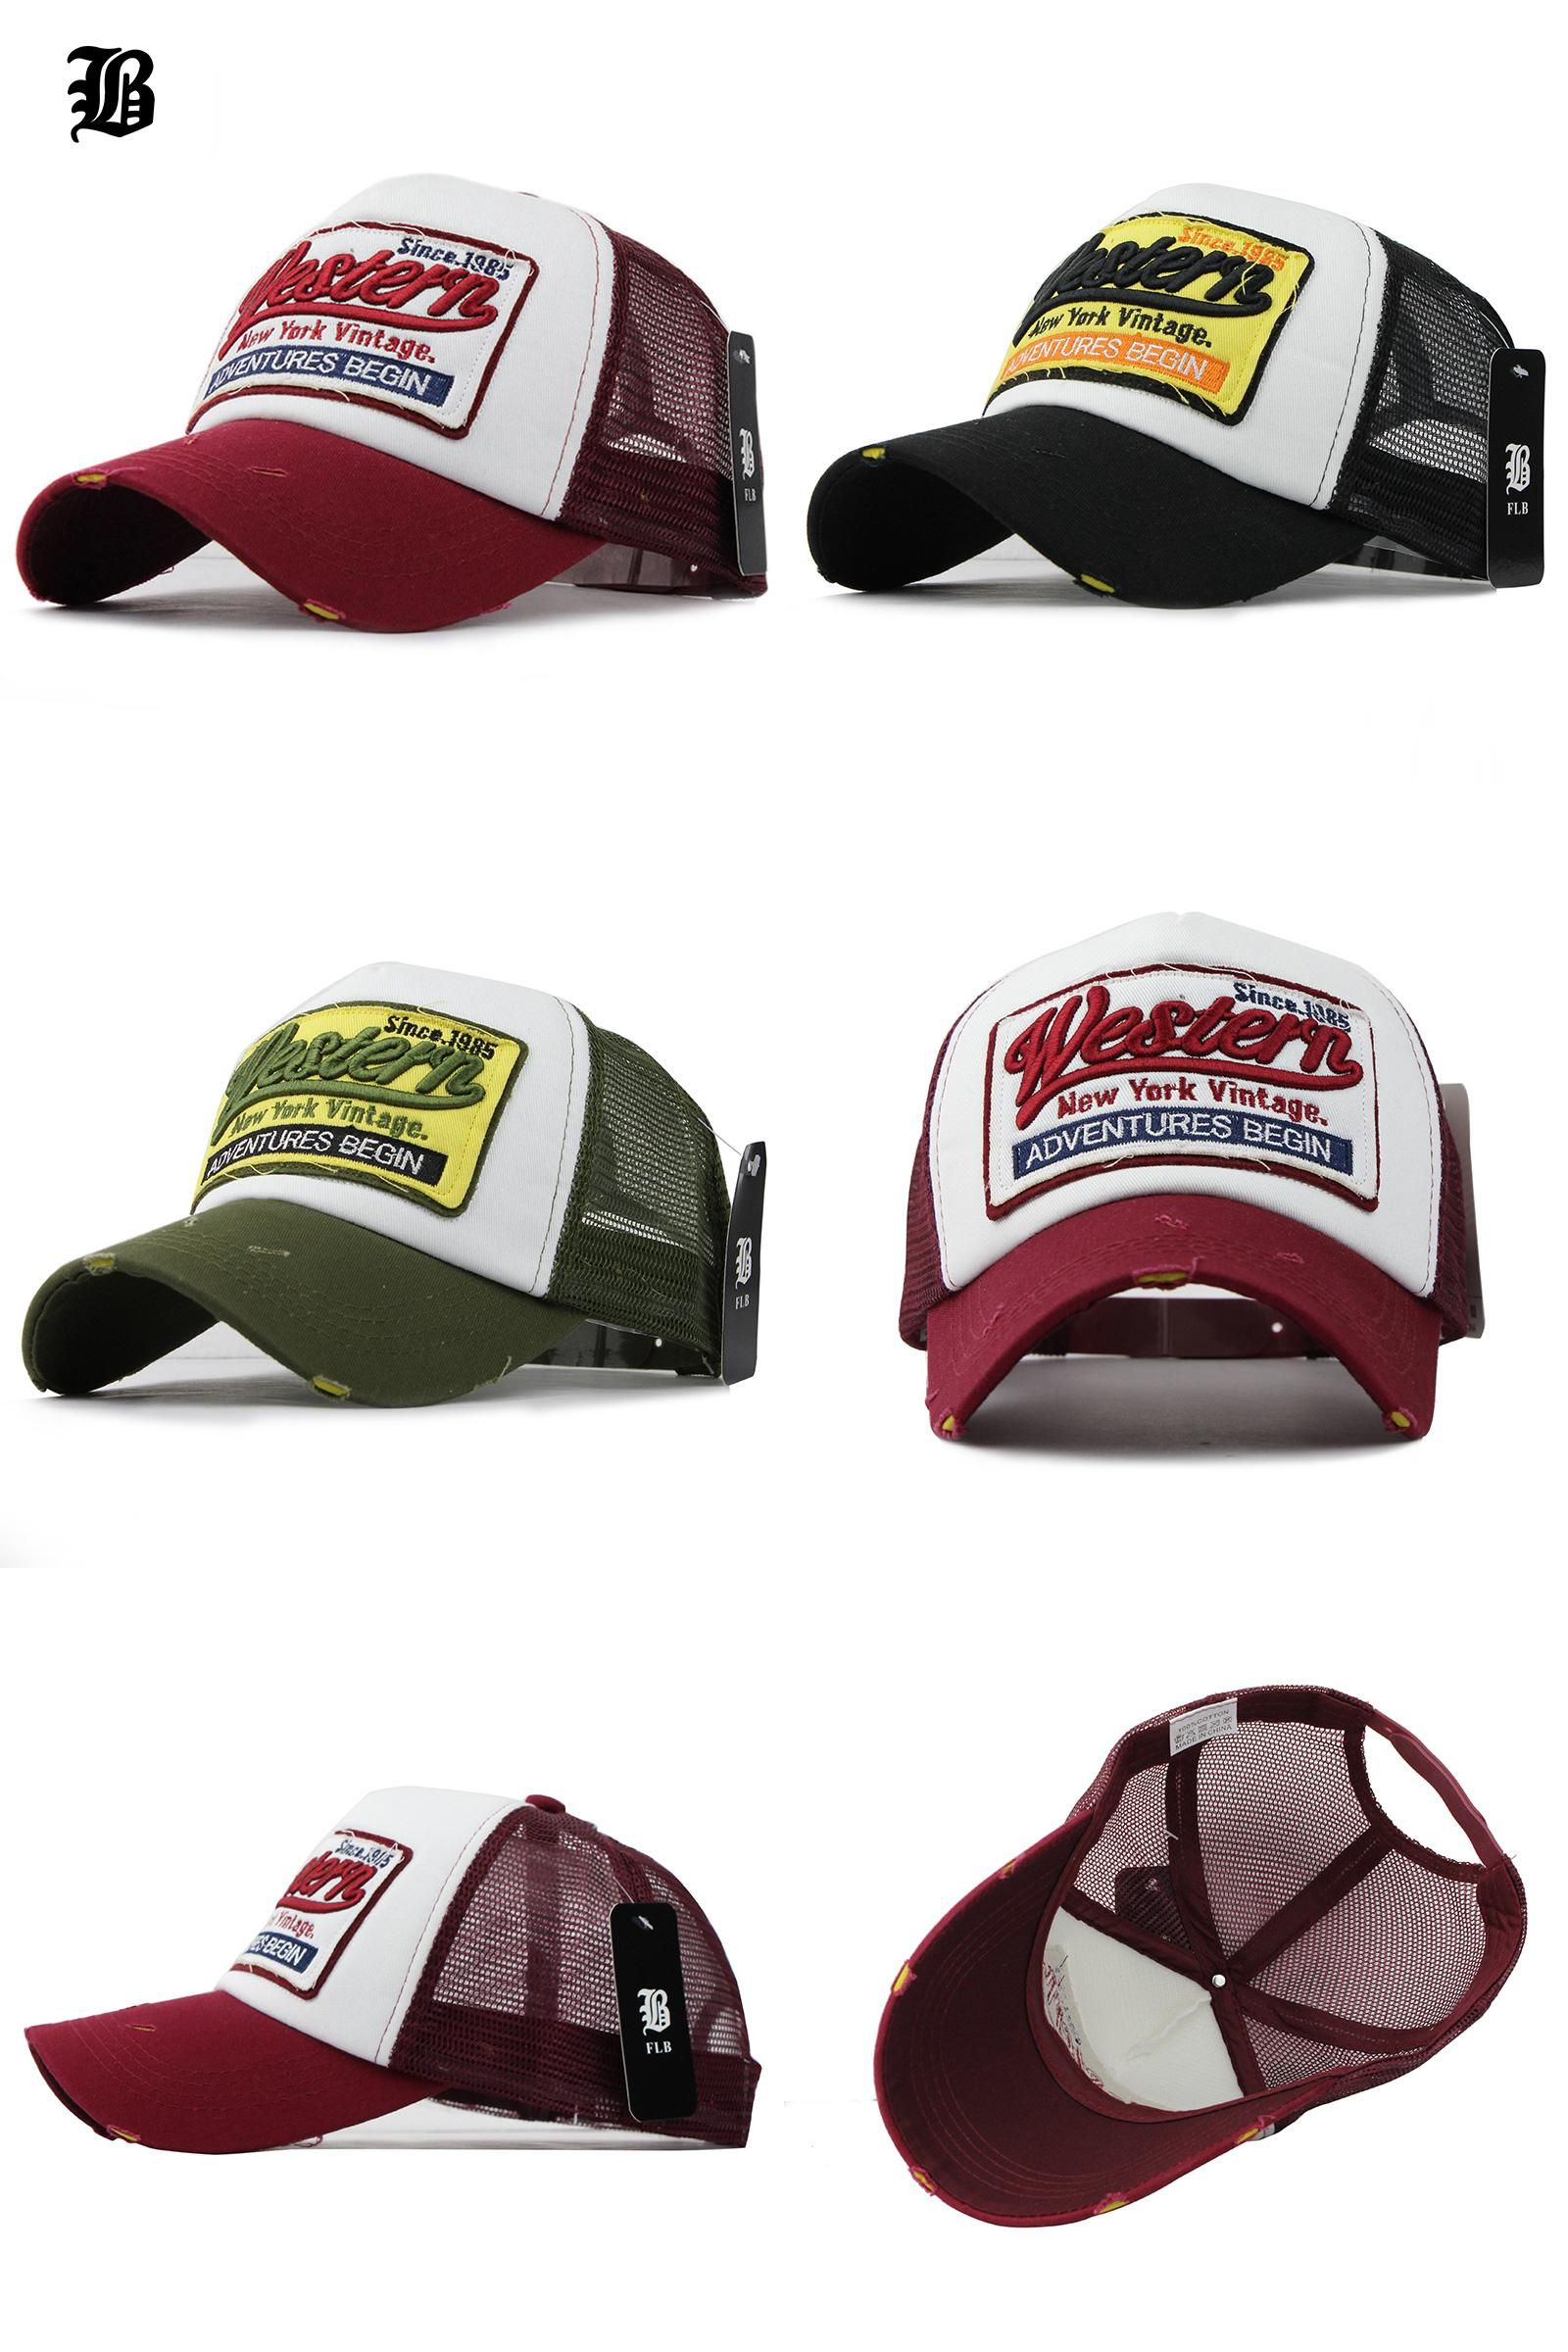 e59b6e68 [Visit to Buy] [FLB] Summer Baseball Cap Embroidery Mesh Cap Hats For Men  Women Gorras Hombre Polo Casual Hip Hop Caps Dad Casquette #Advertisement